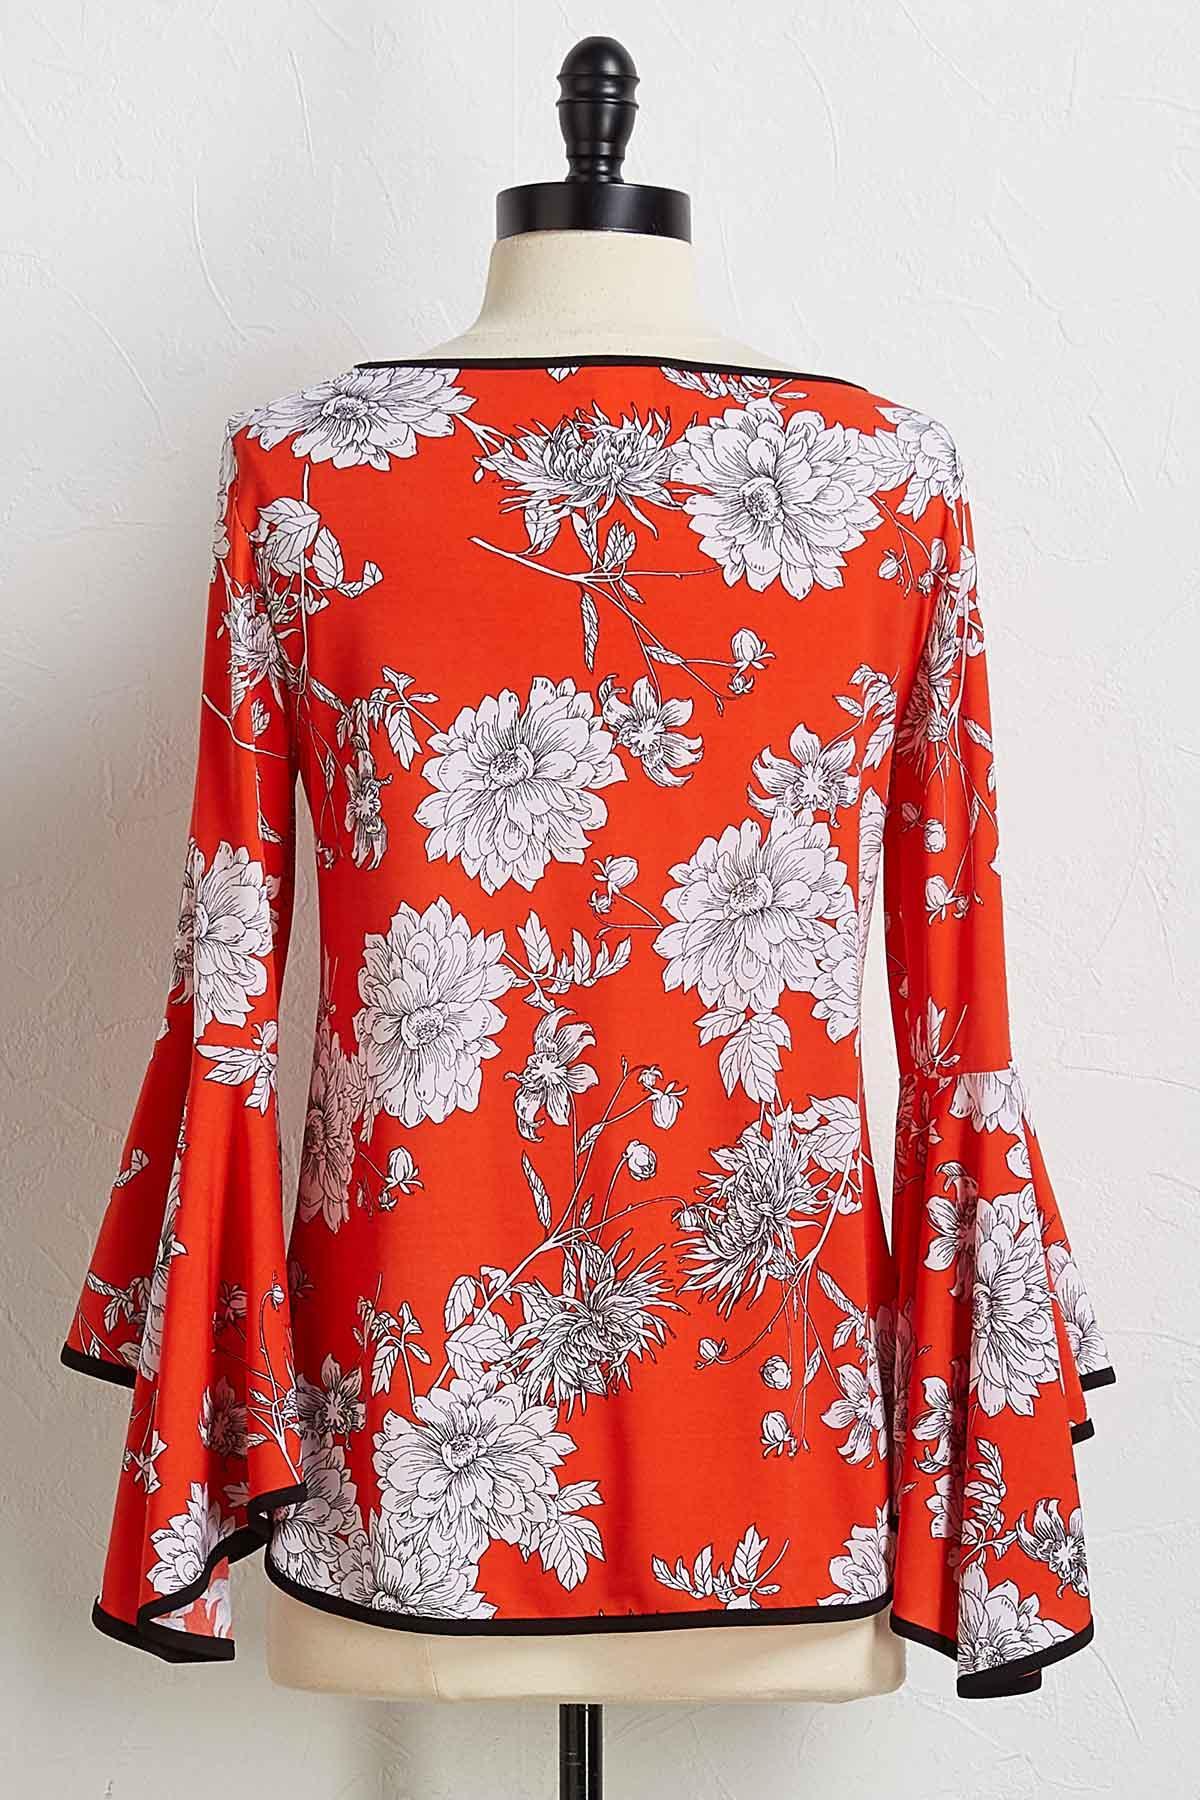 Red Sketch Floral Top